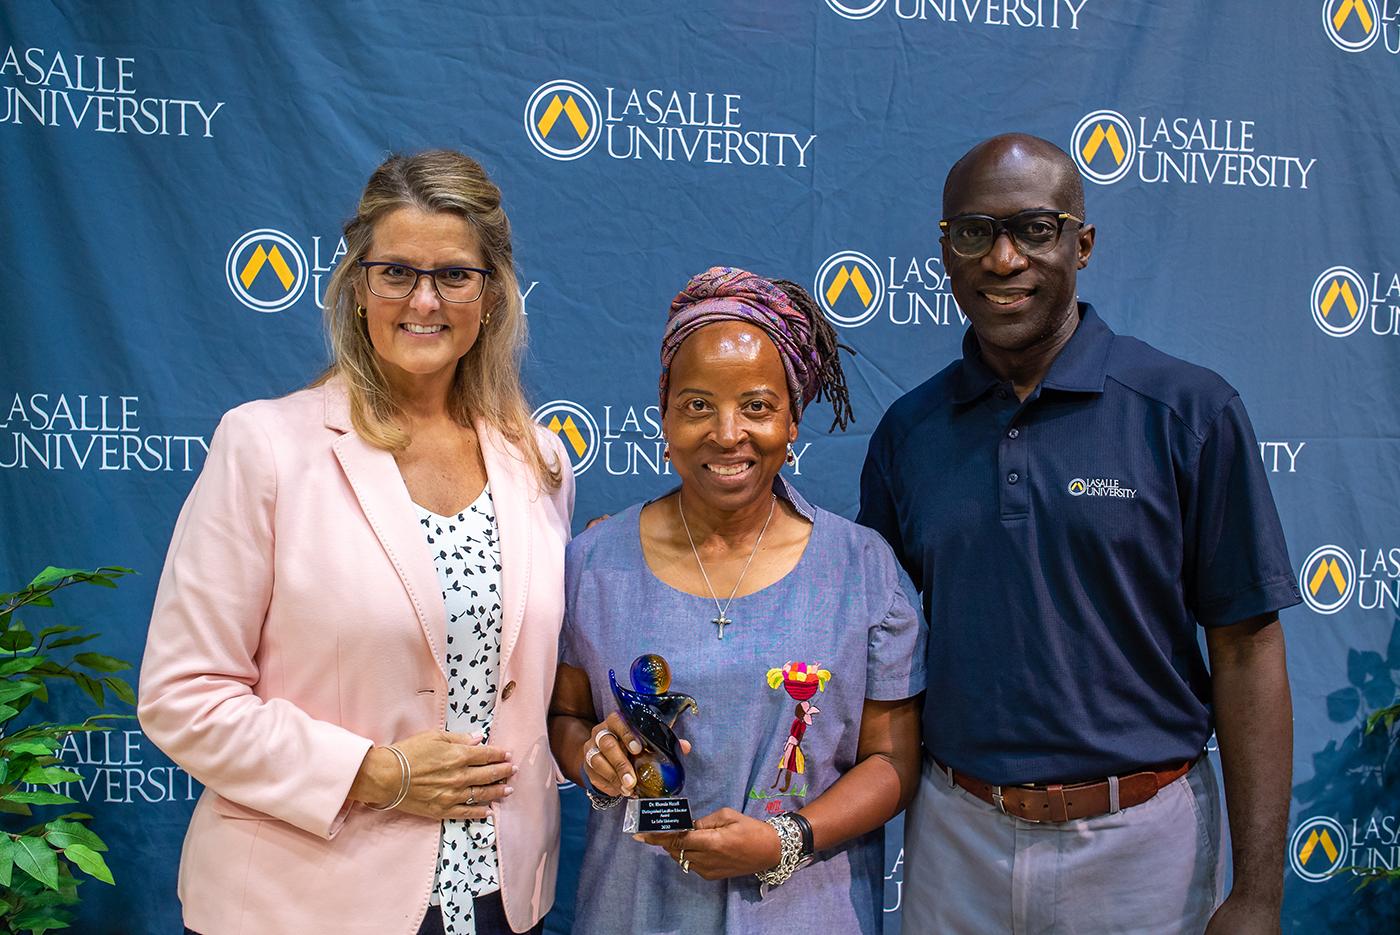 Distinguished Lasallian Education Educator Award Presentation